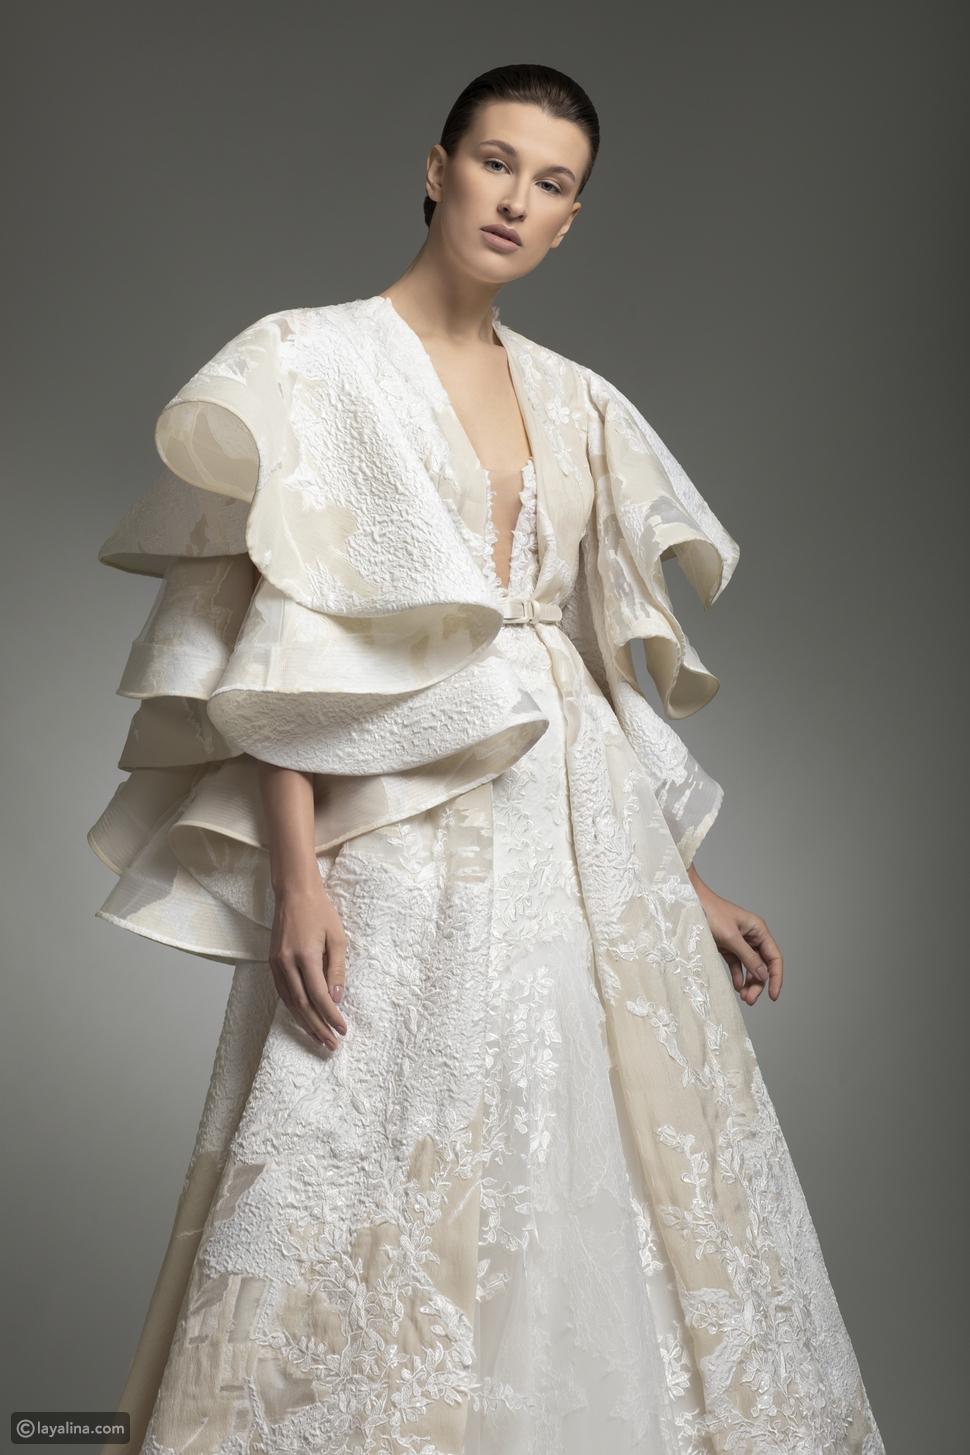 Esposa couture 2020 تروي قصّة الأميرة الملكية